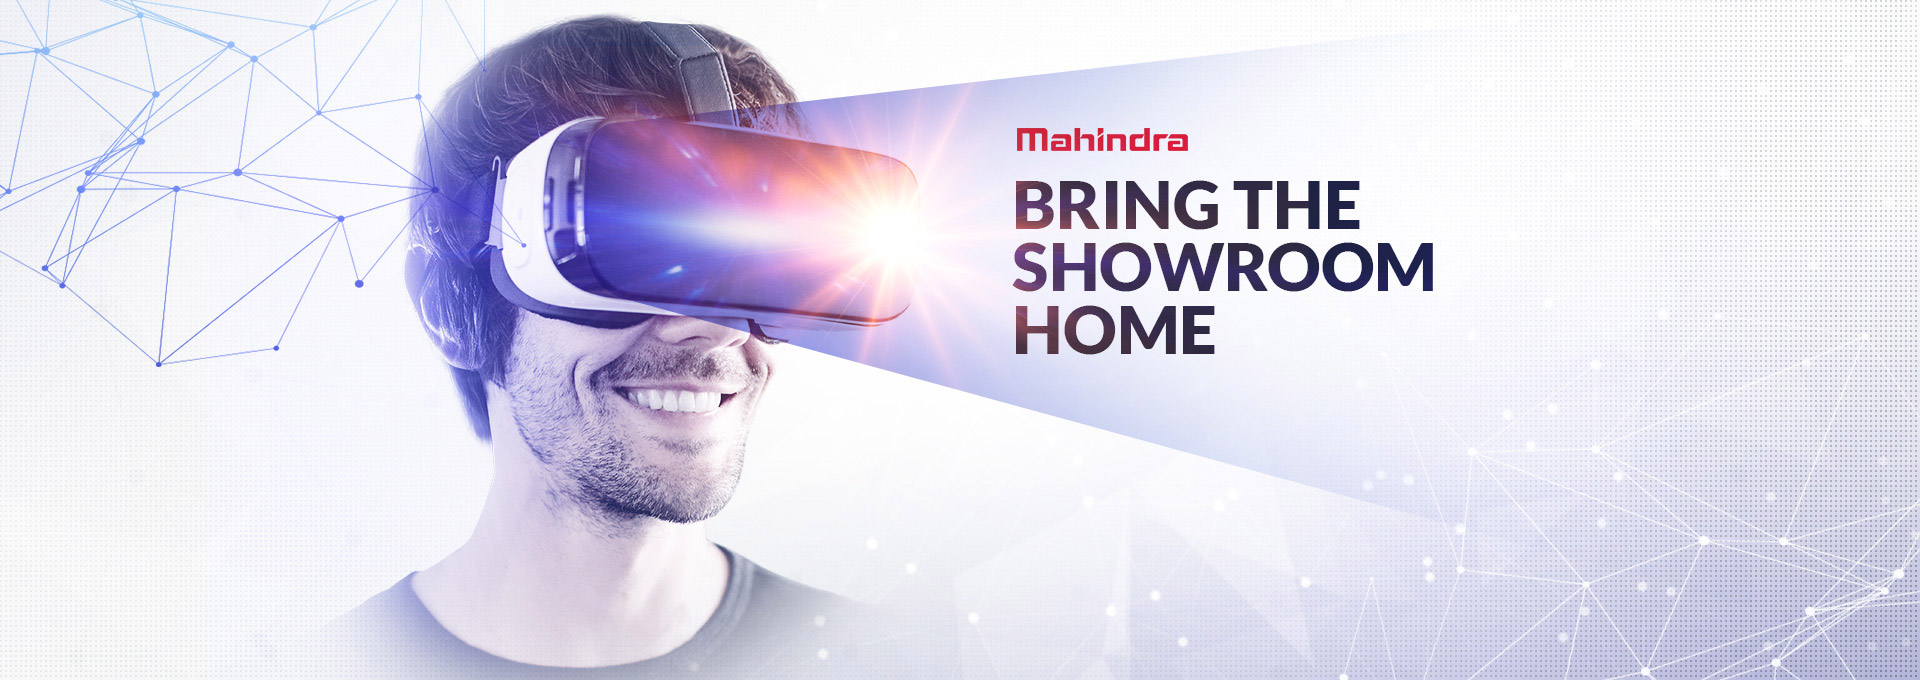 PPS Mahindra Bring Showroom Home